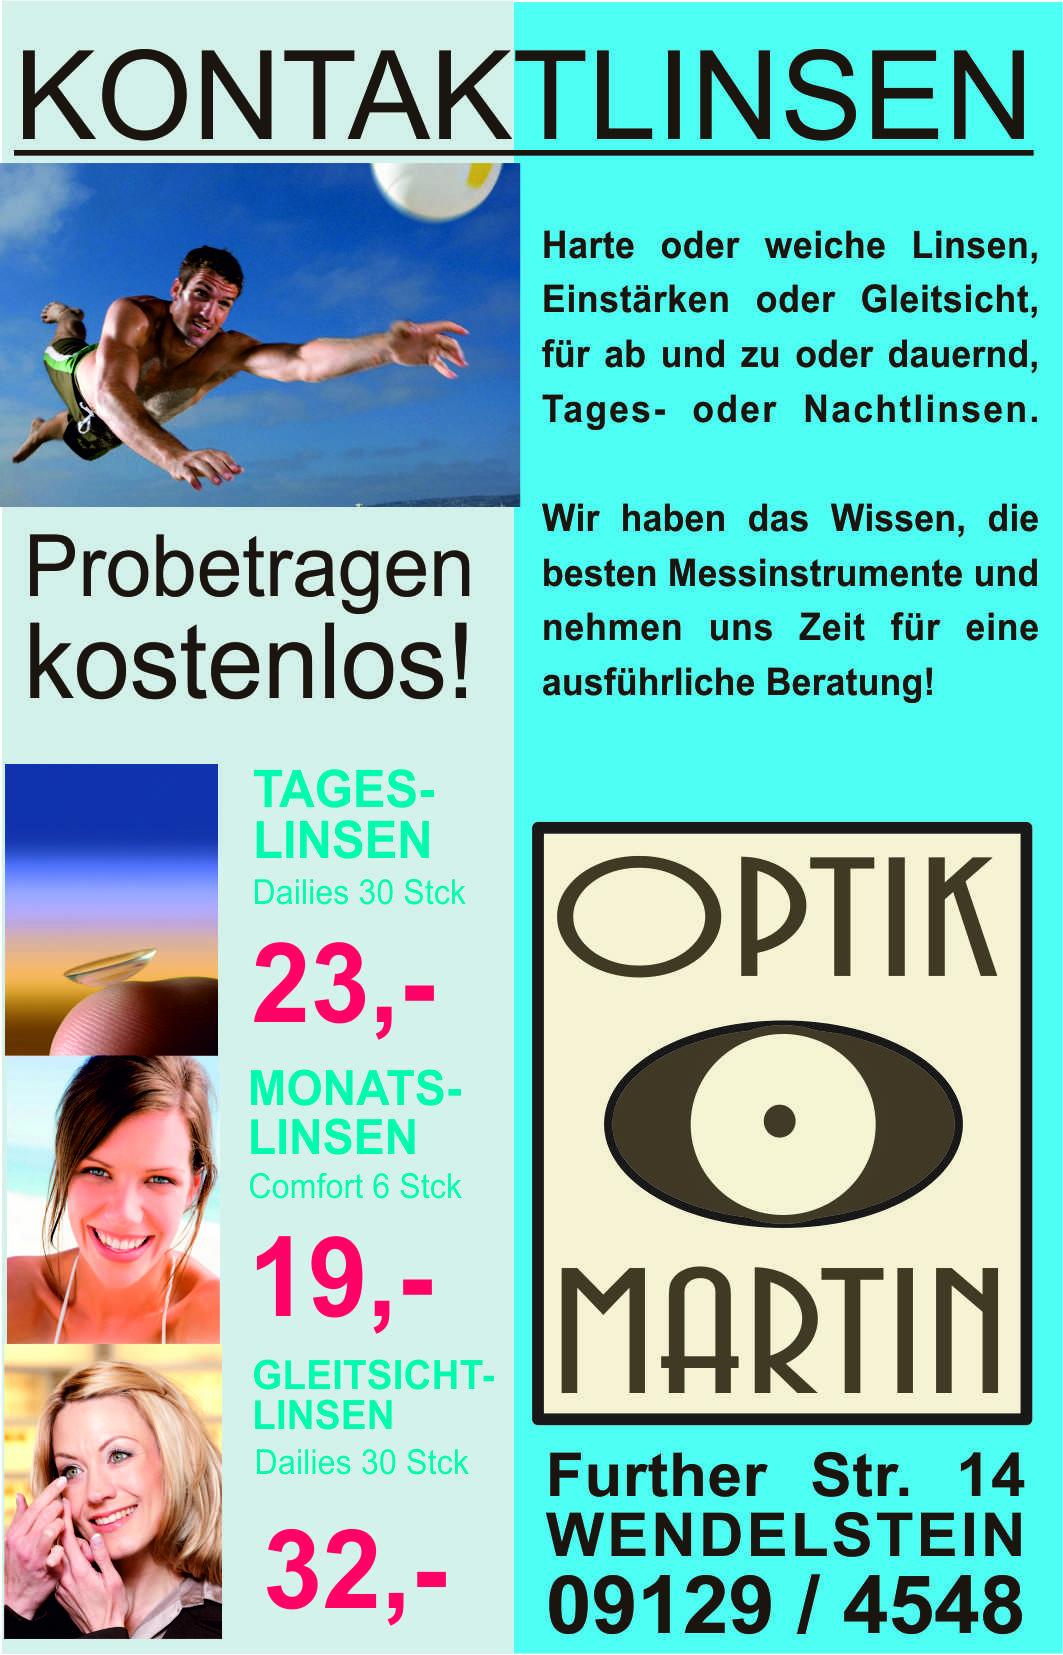 Optik Martin